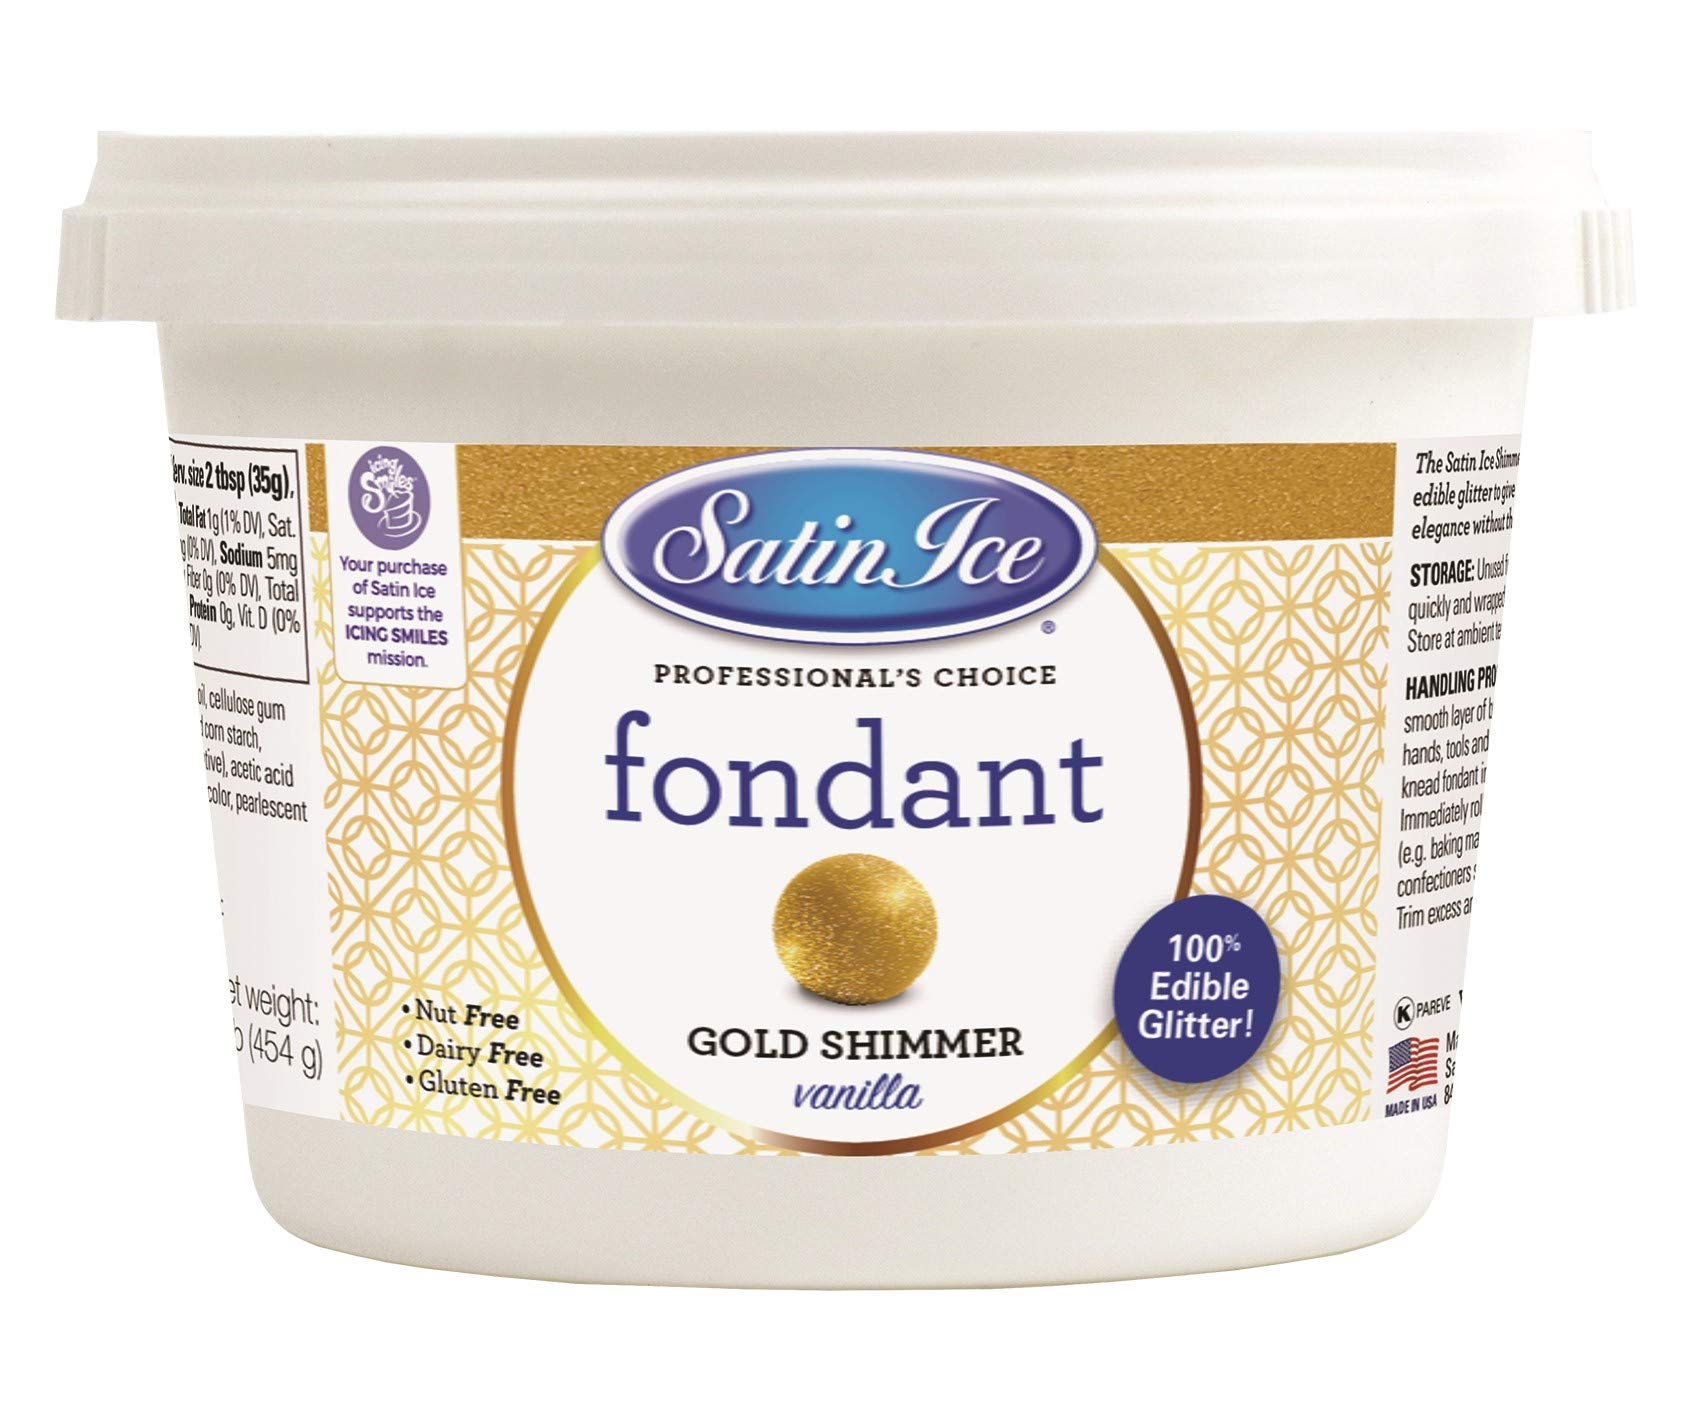 Satin Ice Gold Shimmer Fondant, Vanilla, 1 Pounds